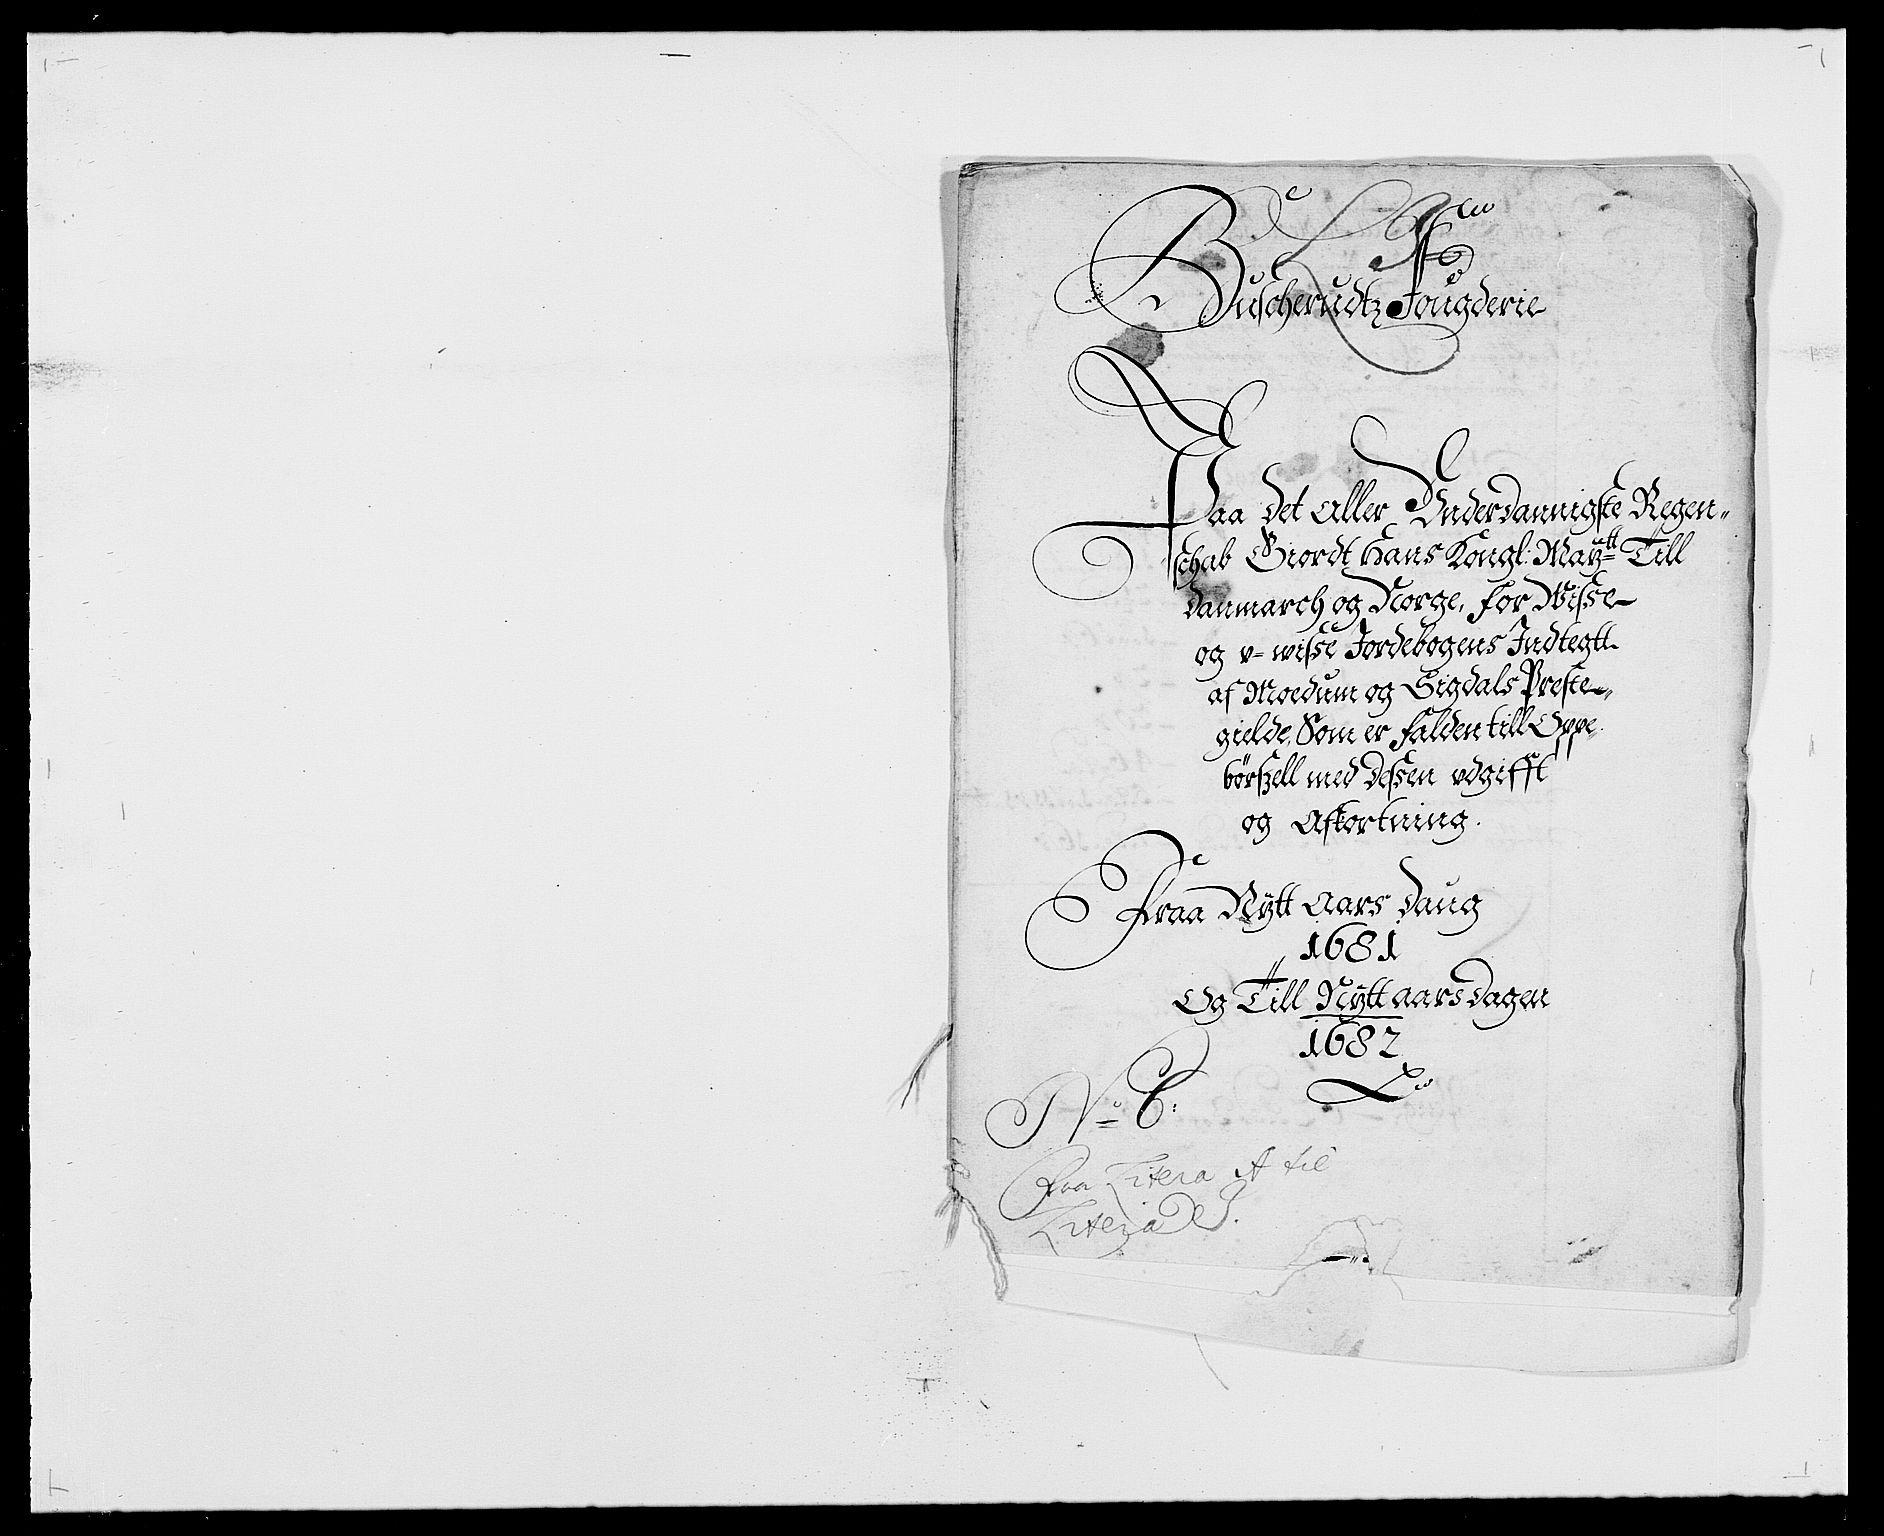 RA, Rentekammeret inntil 1814, Reviderte regnskaper, Fogderegnskap, R25/L1675: Fogderegnskap Buskerud, 1678-1681, s. 359